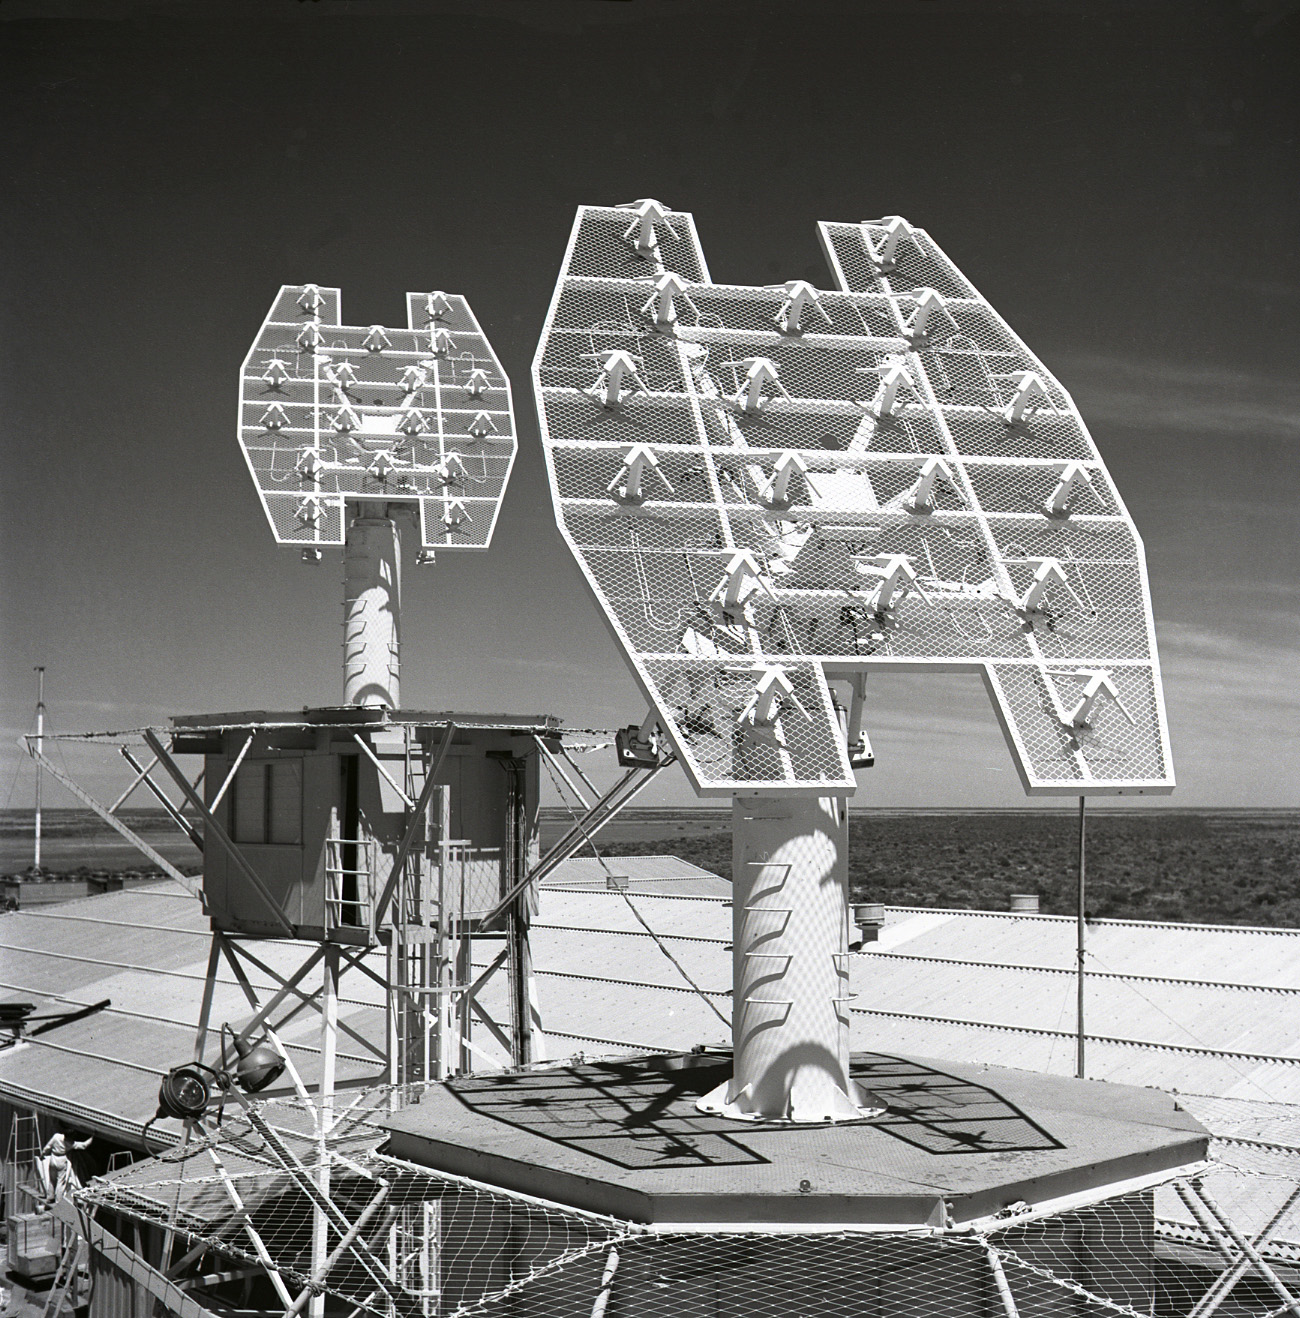 Acq Aid Antennas - Close-up